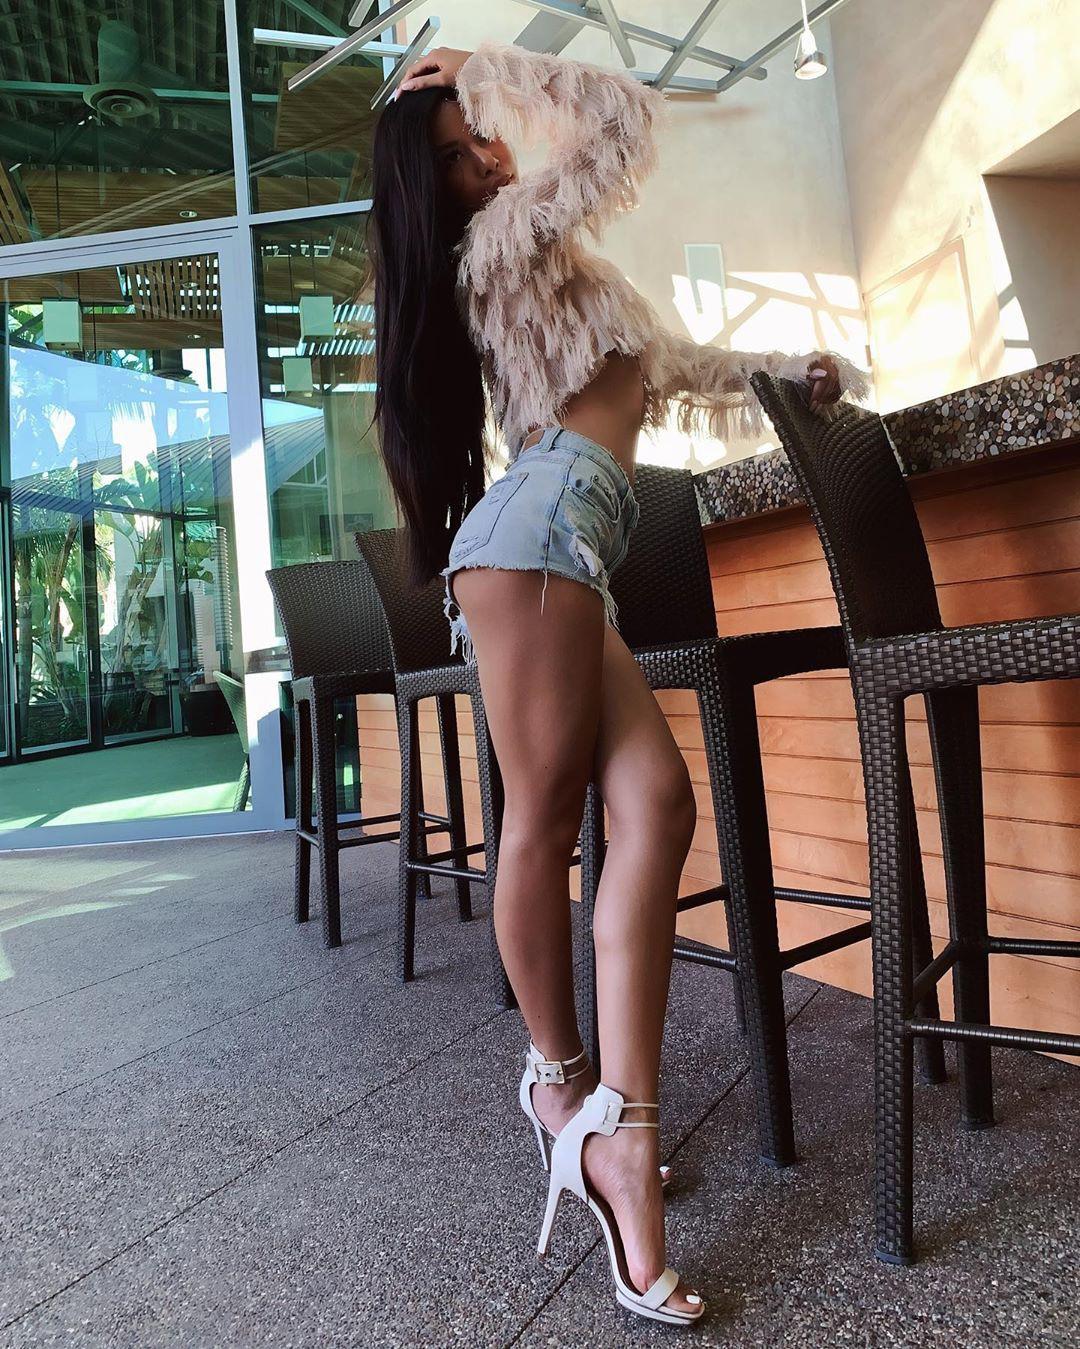 R A V A D E E   S I M shorts outfits for women, hot thighs, legs photo